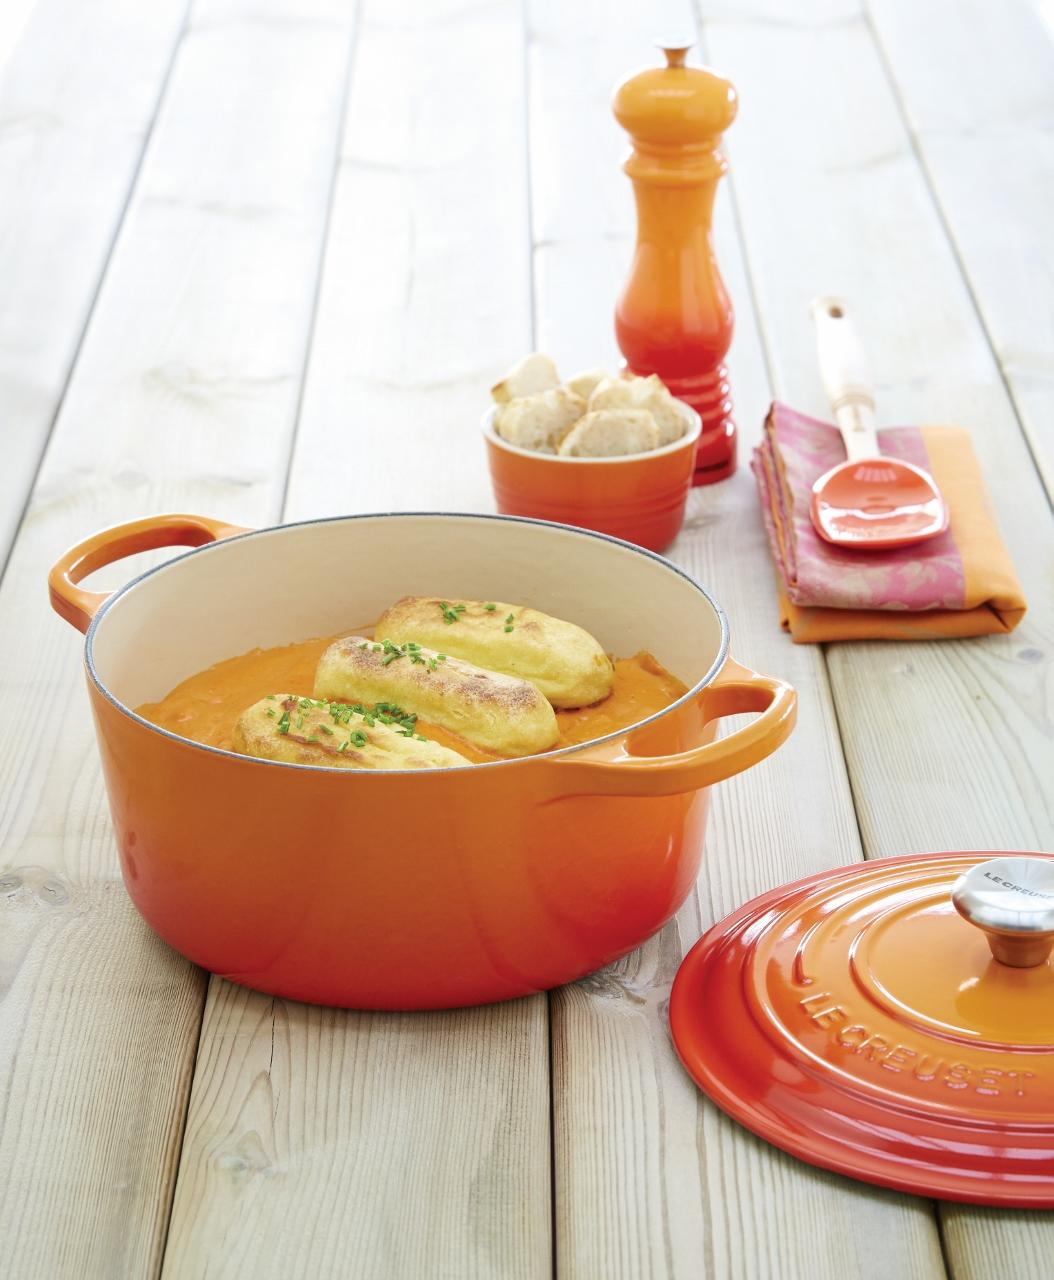 Le Creuset pan oranje